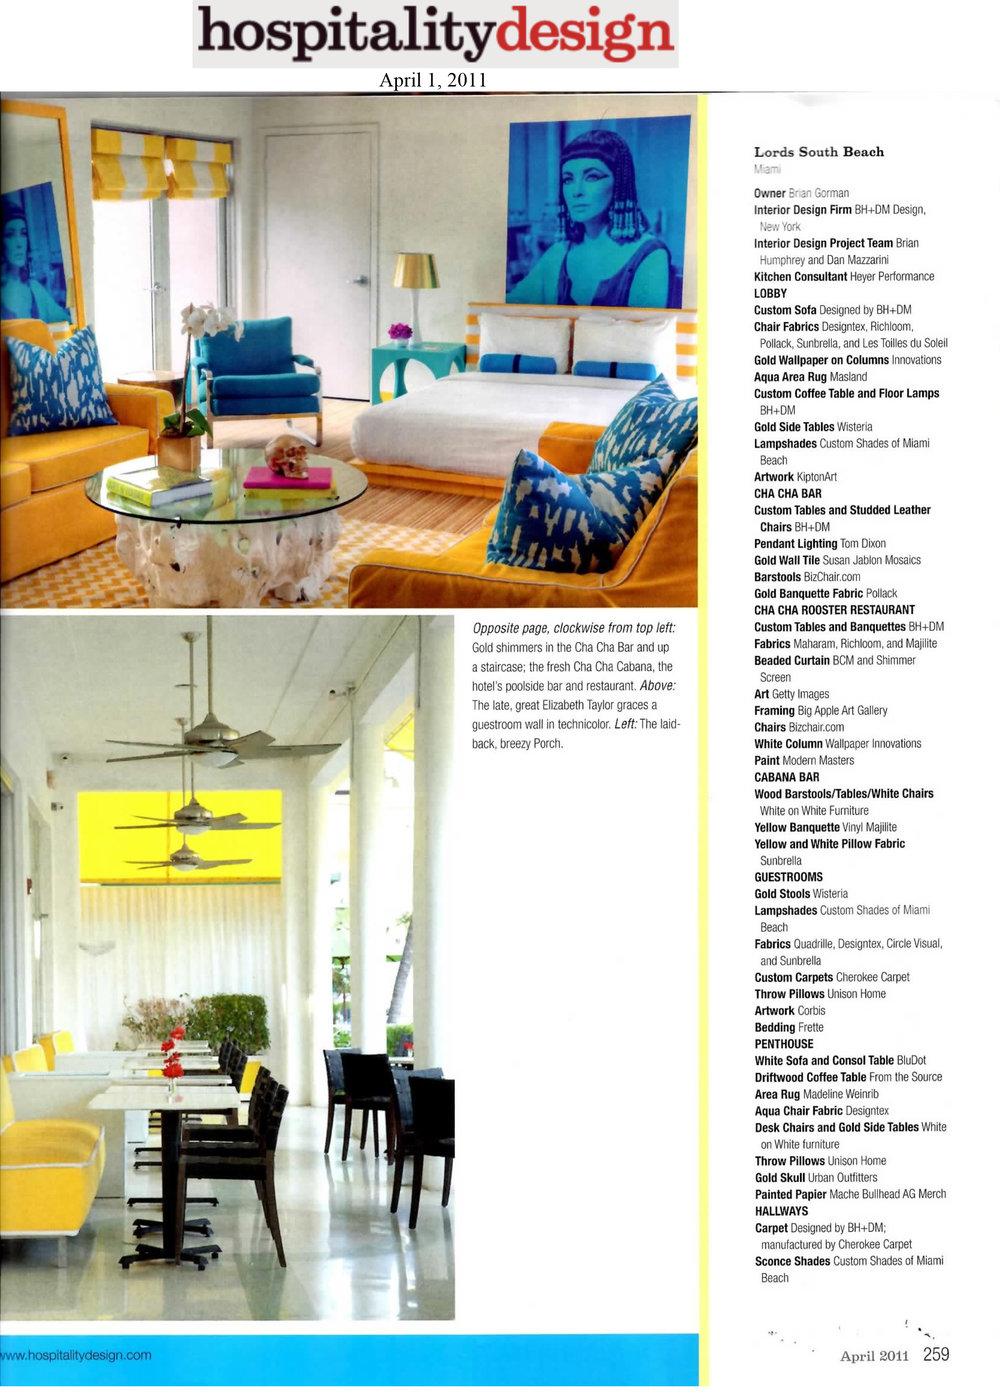 BHDM Hospitality Design 4.1.11 4.jpg